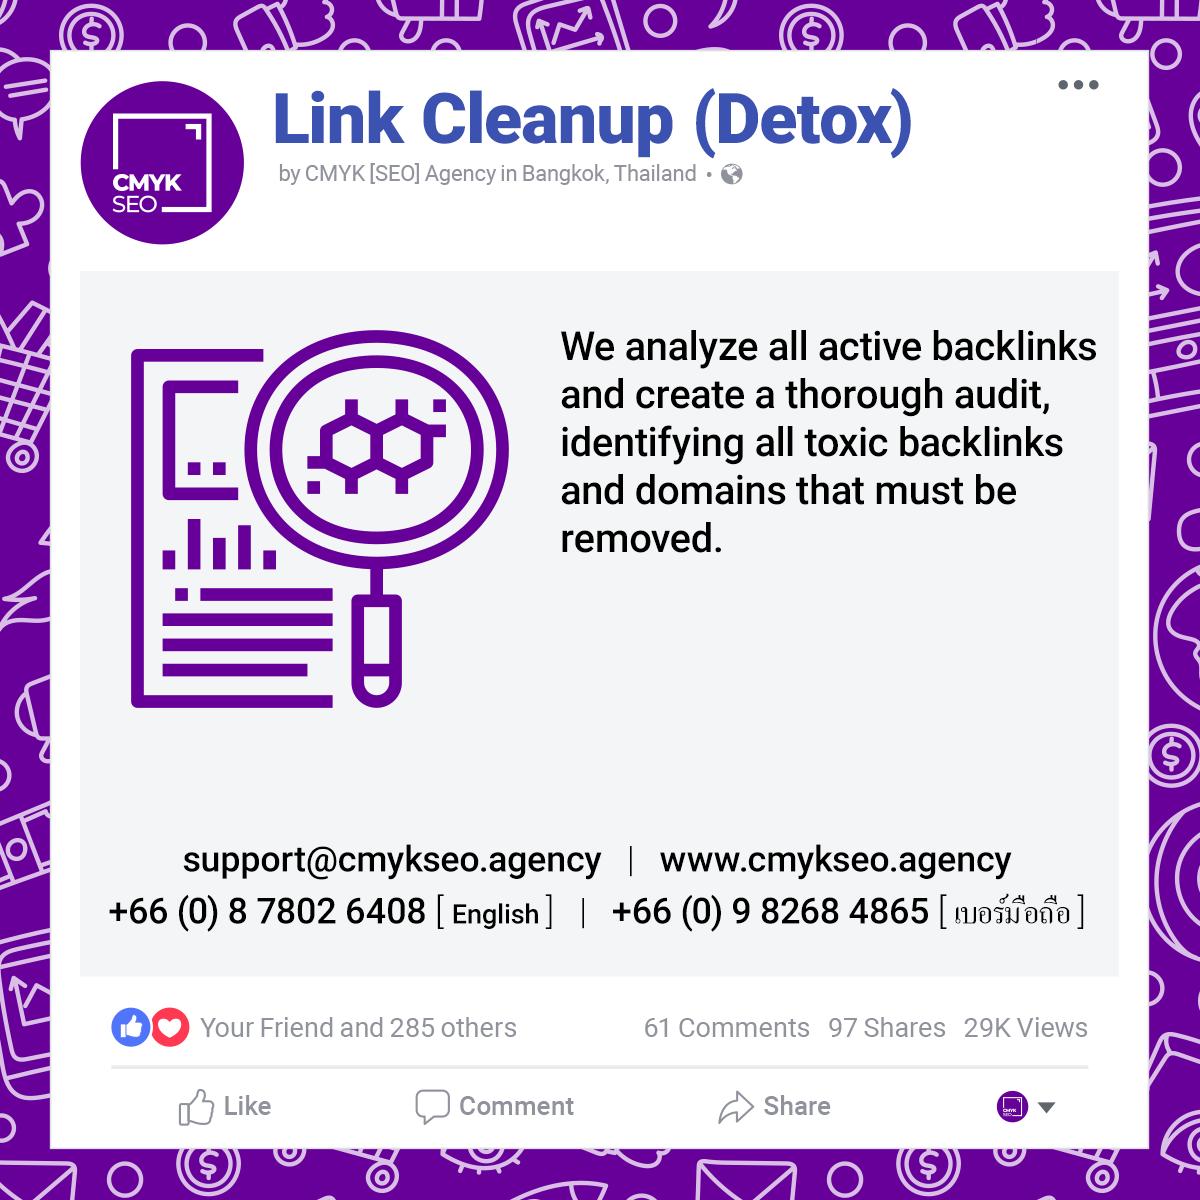 Link Cleanup Detox Services by CMYK SEO Agency in Bangkok Thailand | CMYK [SEO]: Bangkok SEO/SEM Agency